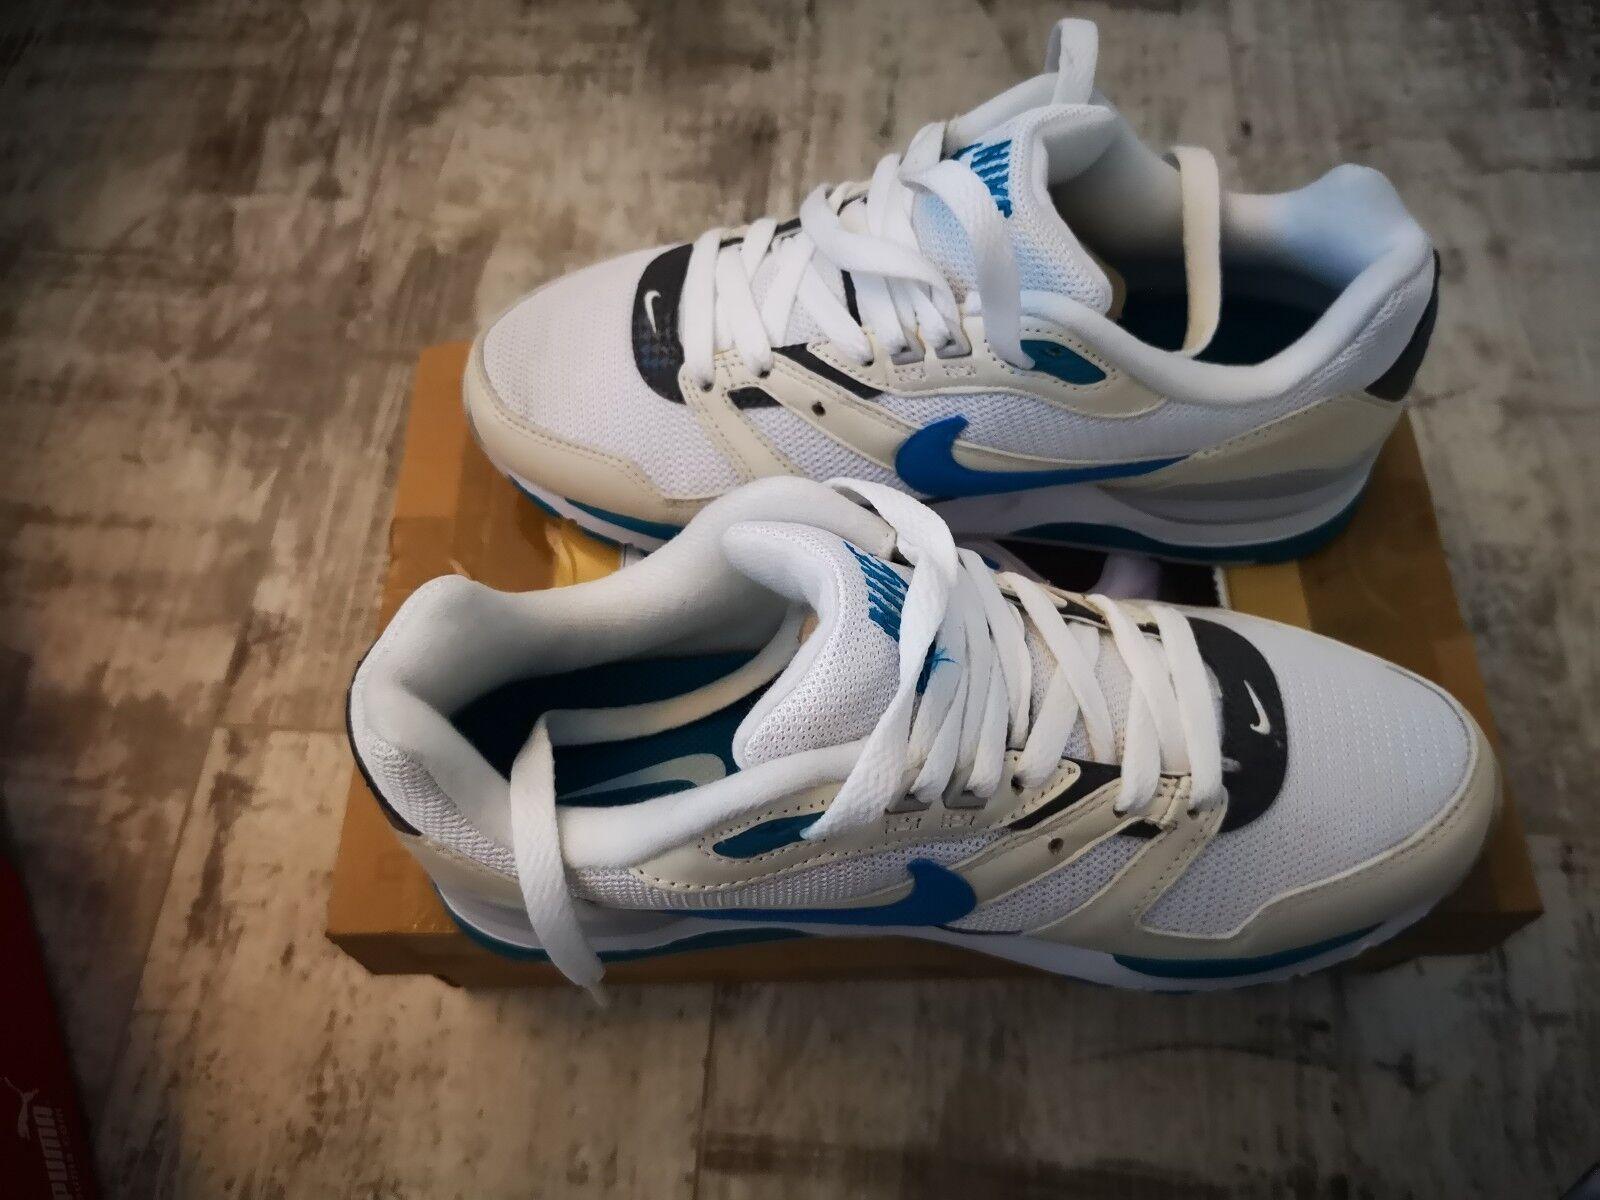 Nike Twilight Runner NEU MIT KARTON GR.36.5 ocnuwc6215 2019